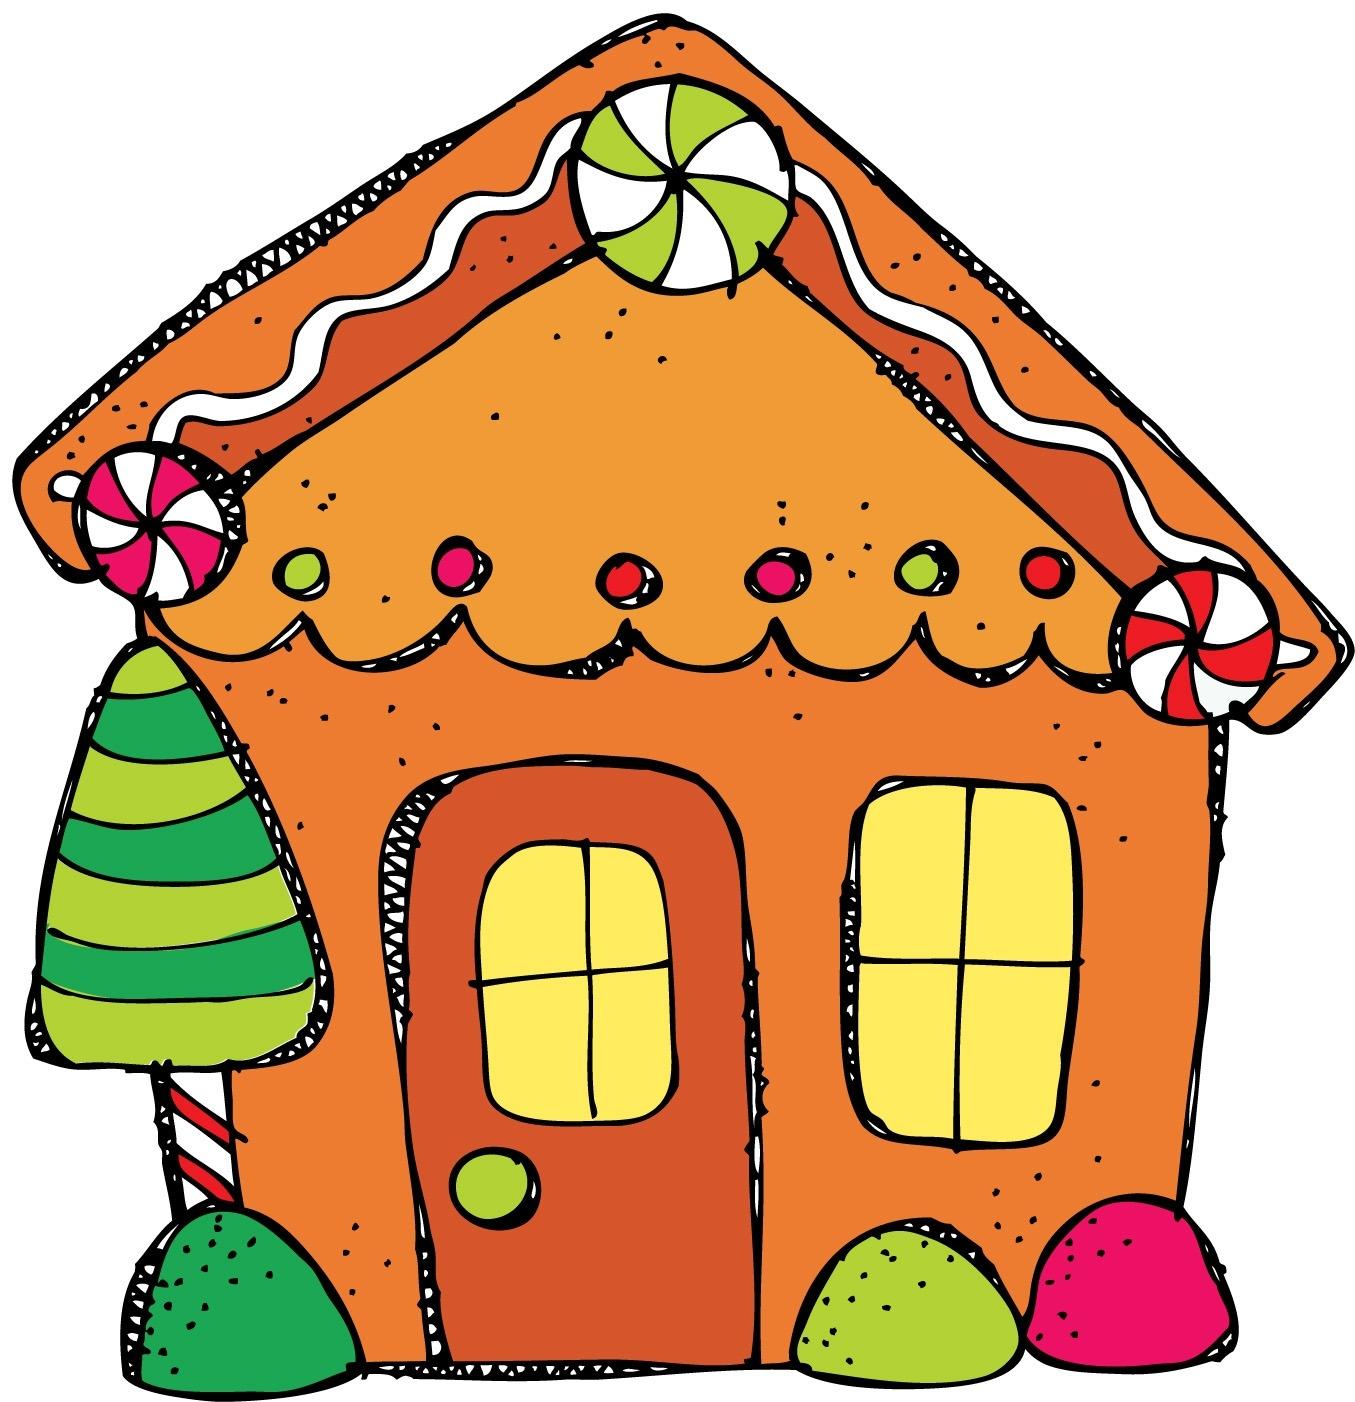 Hosue clipart border House Border Clipart Gingerbread Cliparts